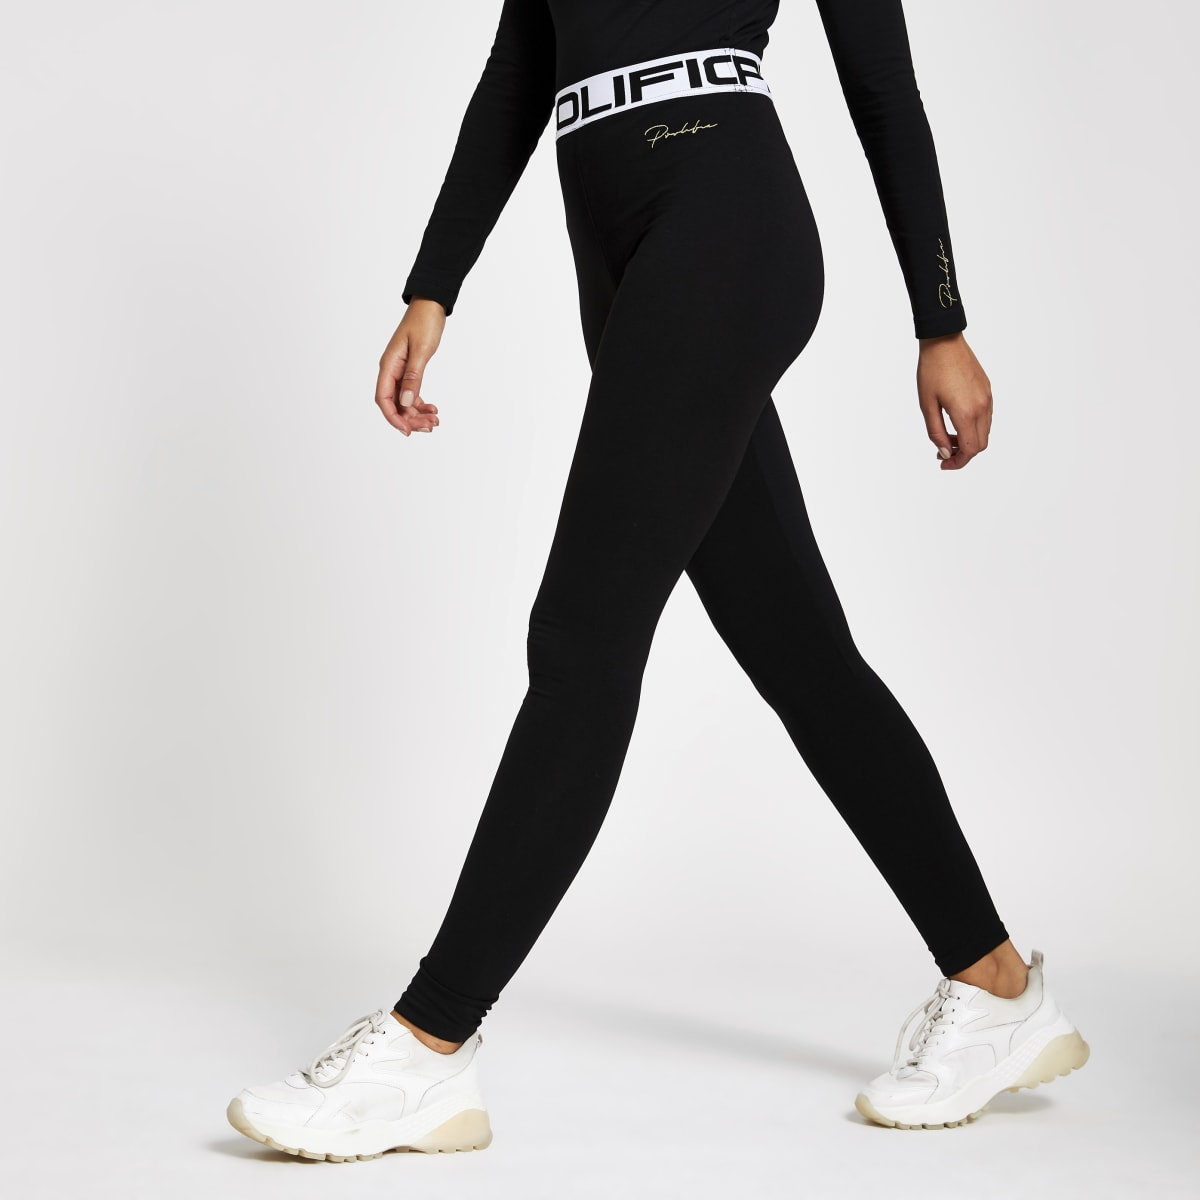 Black 'Prolific' high waist leggings